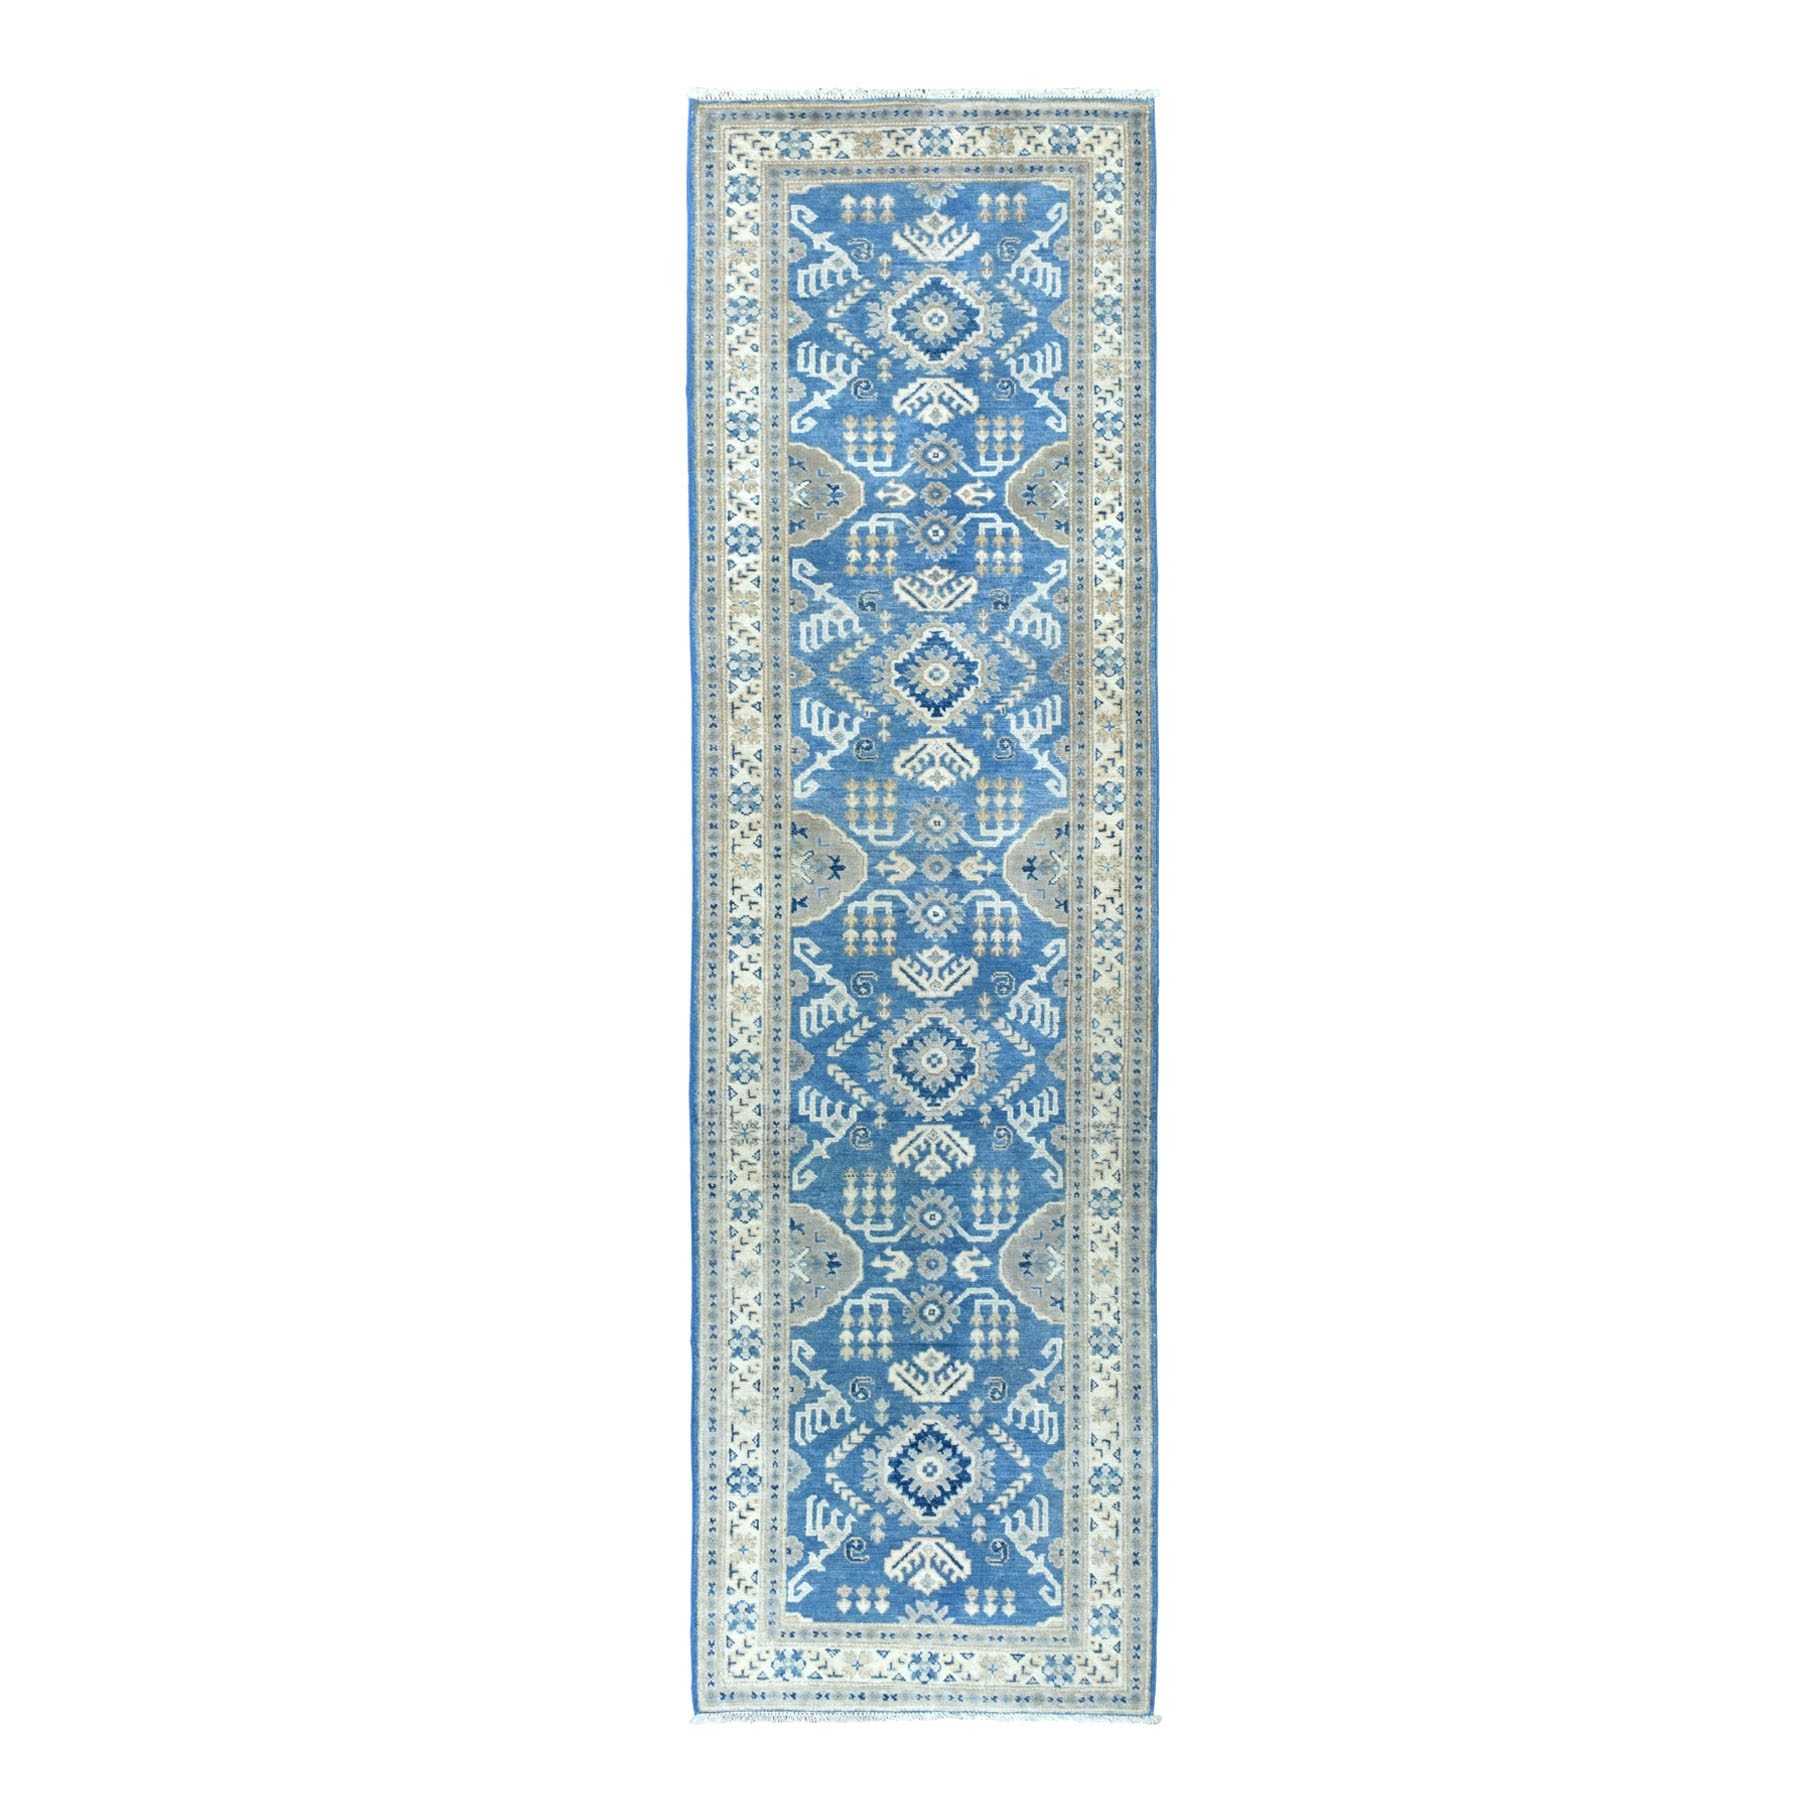 "2'7""X9'5"" Blue Vintage Look Kazak Geometric Design Hand Knotted Runner Oriental Rug moaeabca"